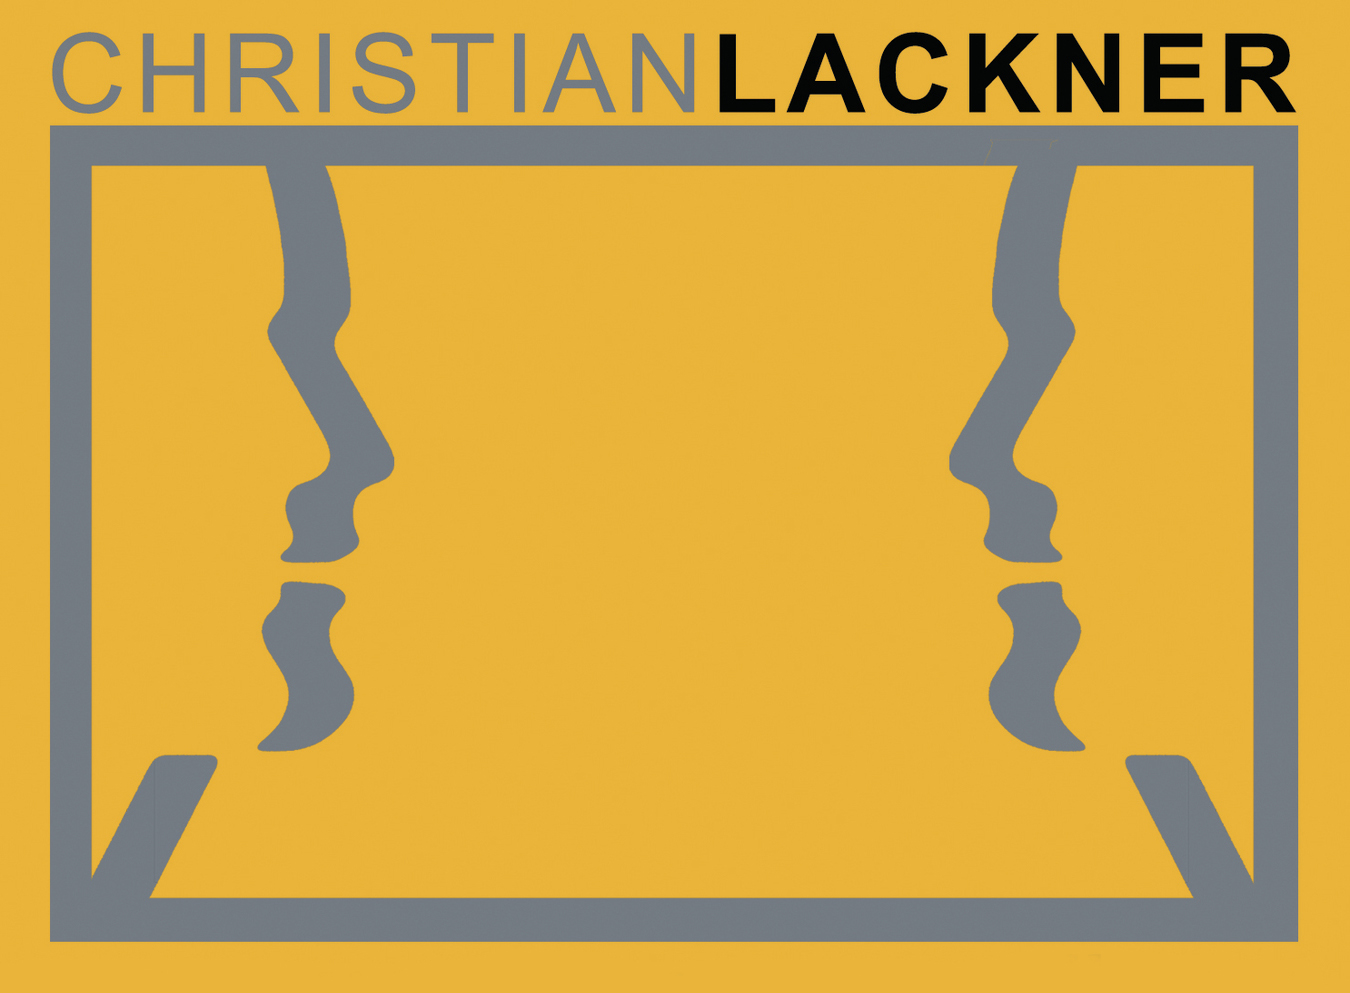 Logopädie Hildesheim – Logopädische Praxis – Christian Lackner Logo